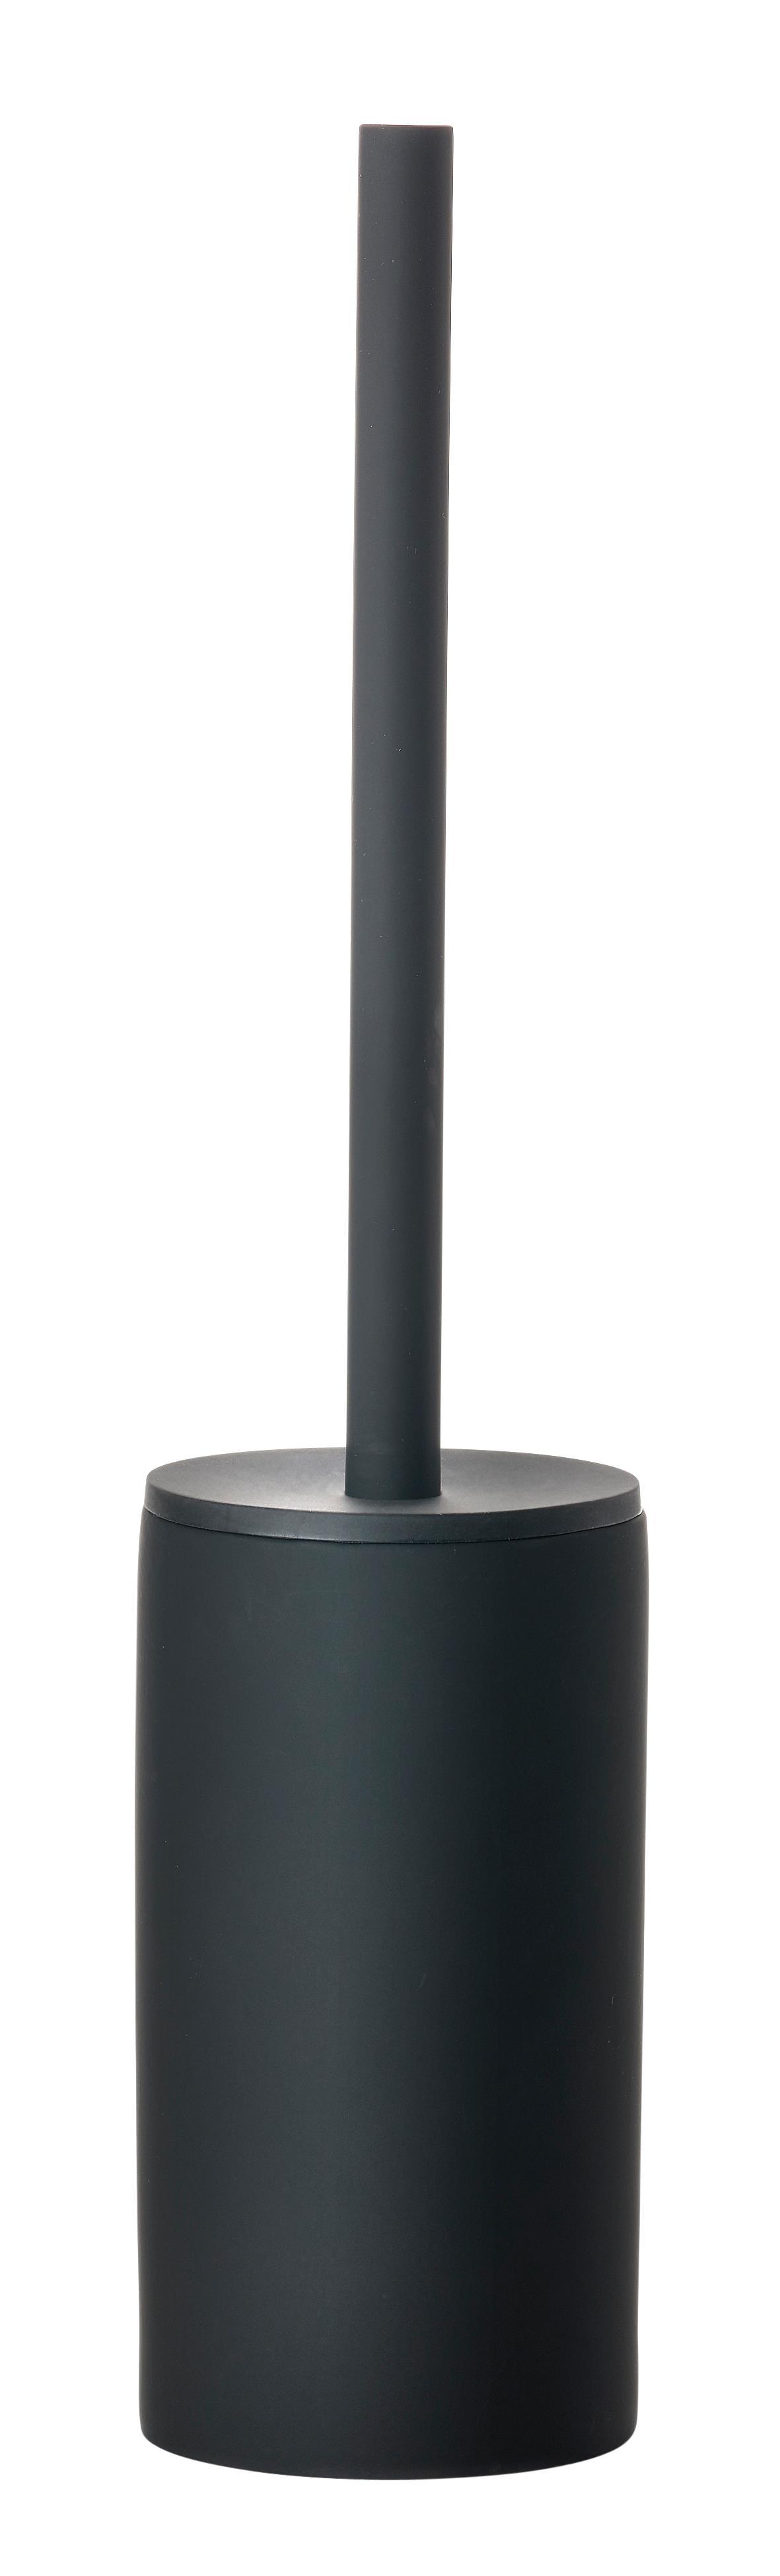 Zone - Solo Toilet Brush - Black (330240)